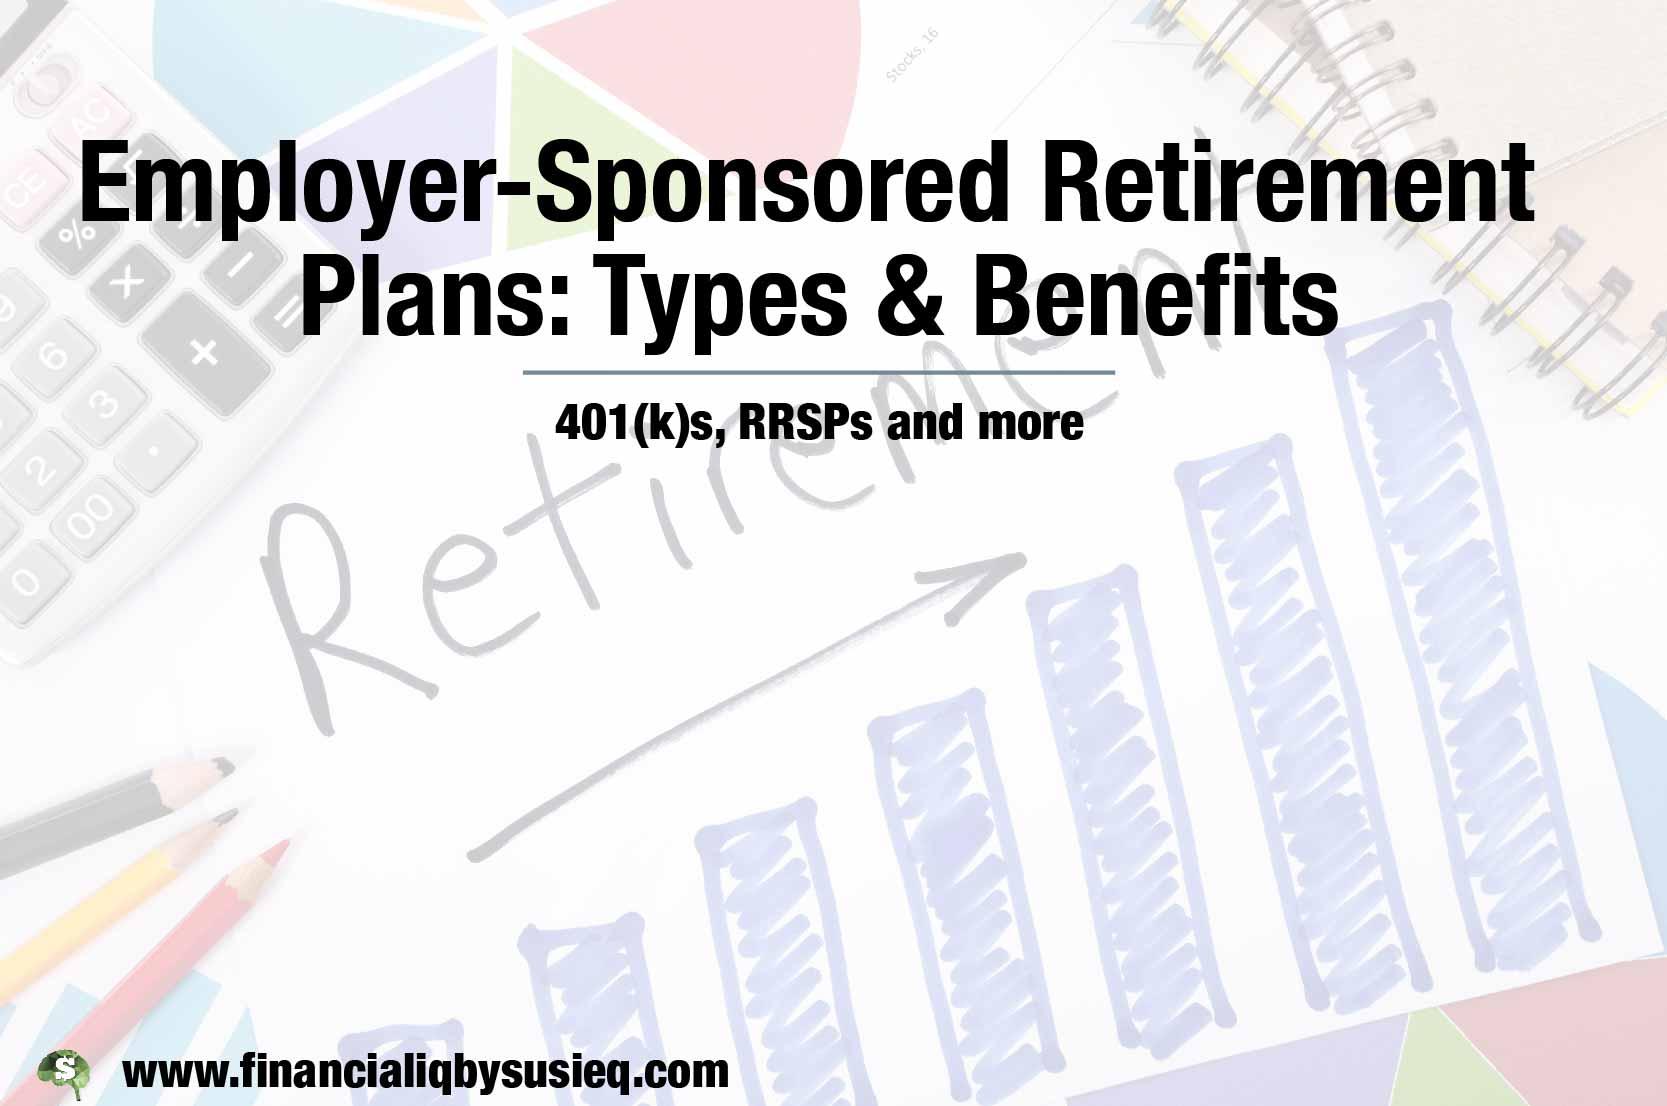 Employer-Sponsored Retirement Plans: Types & Benefits